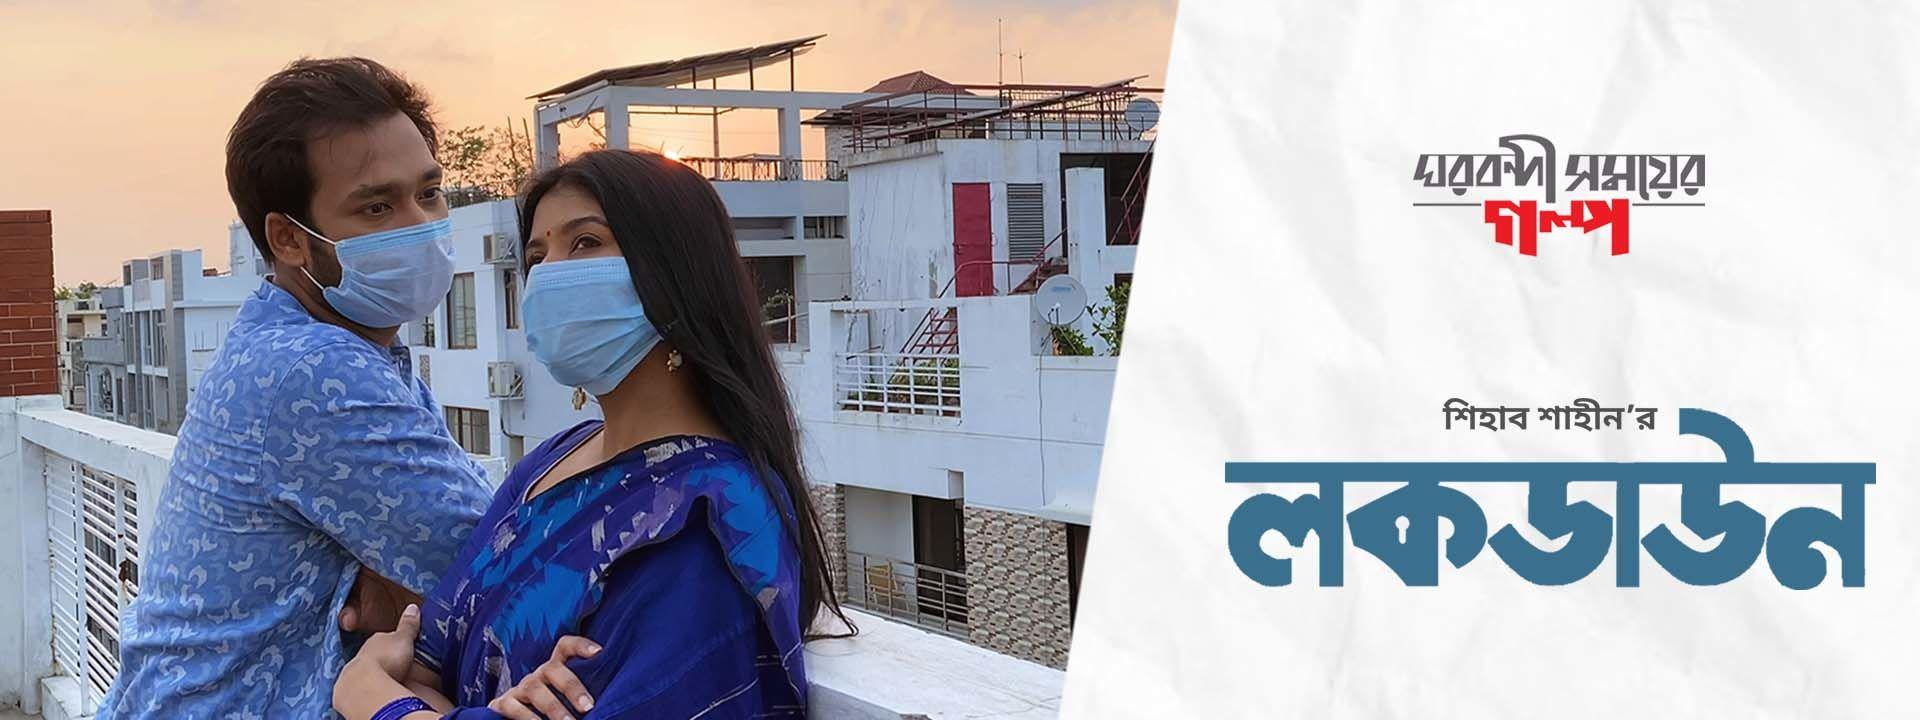 Ghorbondi Somoyer Golpo (2020) Bangla 720p WEB-DL x264 950MB Download